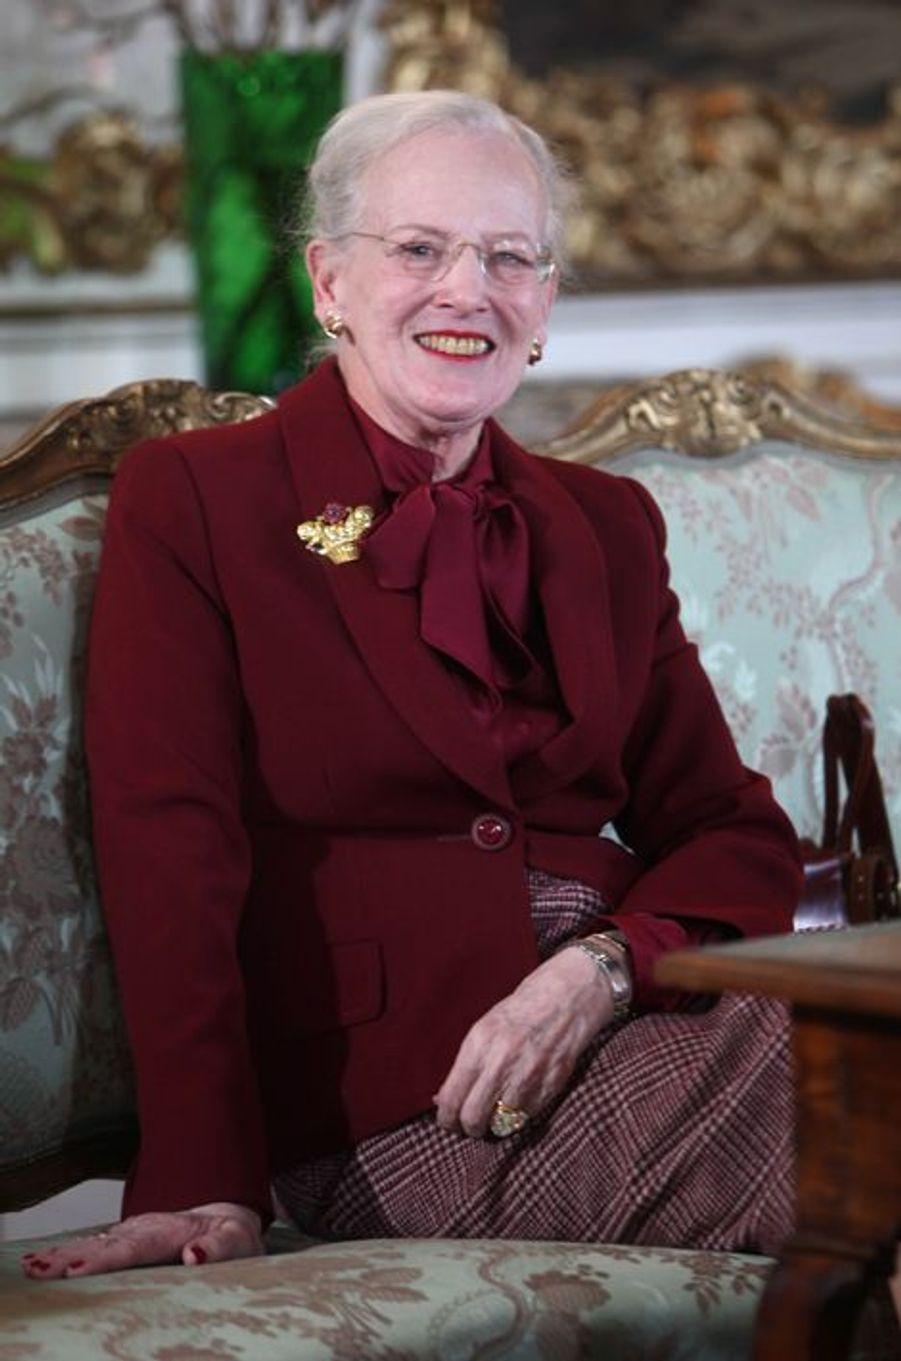 La reine Margrethe II de Danemark, le 13 avril 2015